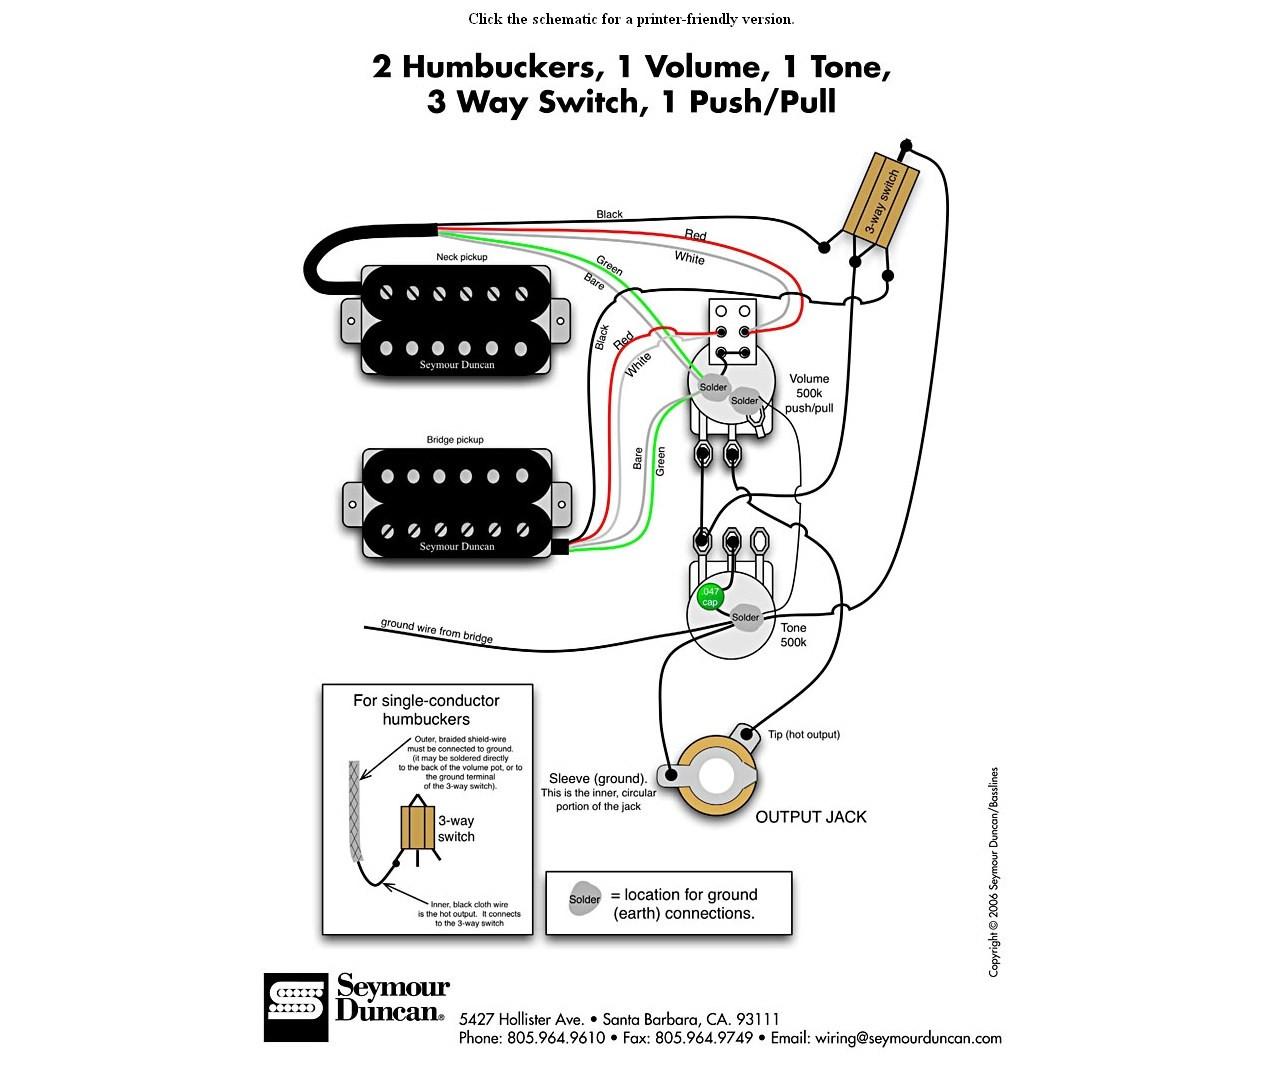 dimarzio pickup wiring diagram to duncan - wiring diagram schematics seymour duncan wiring diagram for 1 pickup  wiring diagram schematics